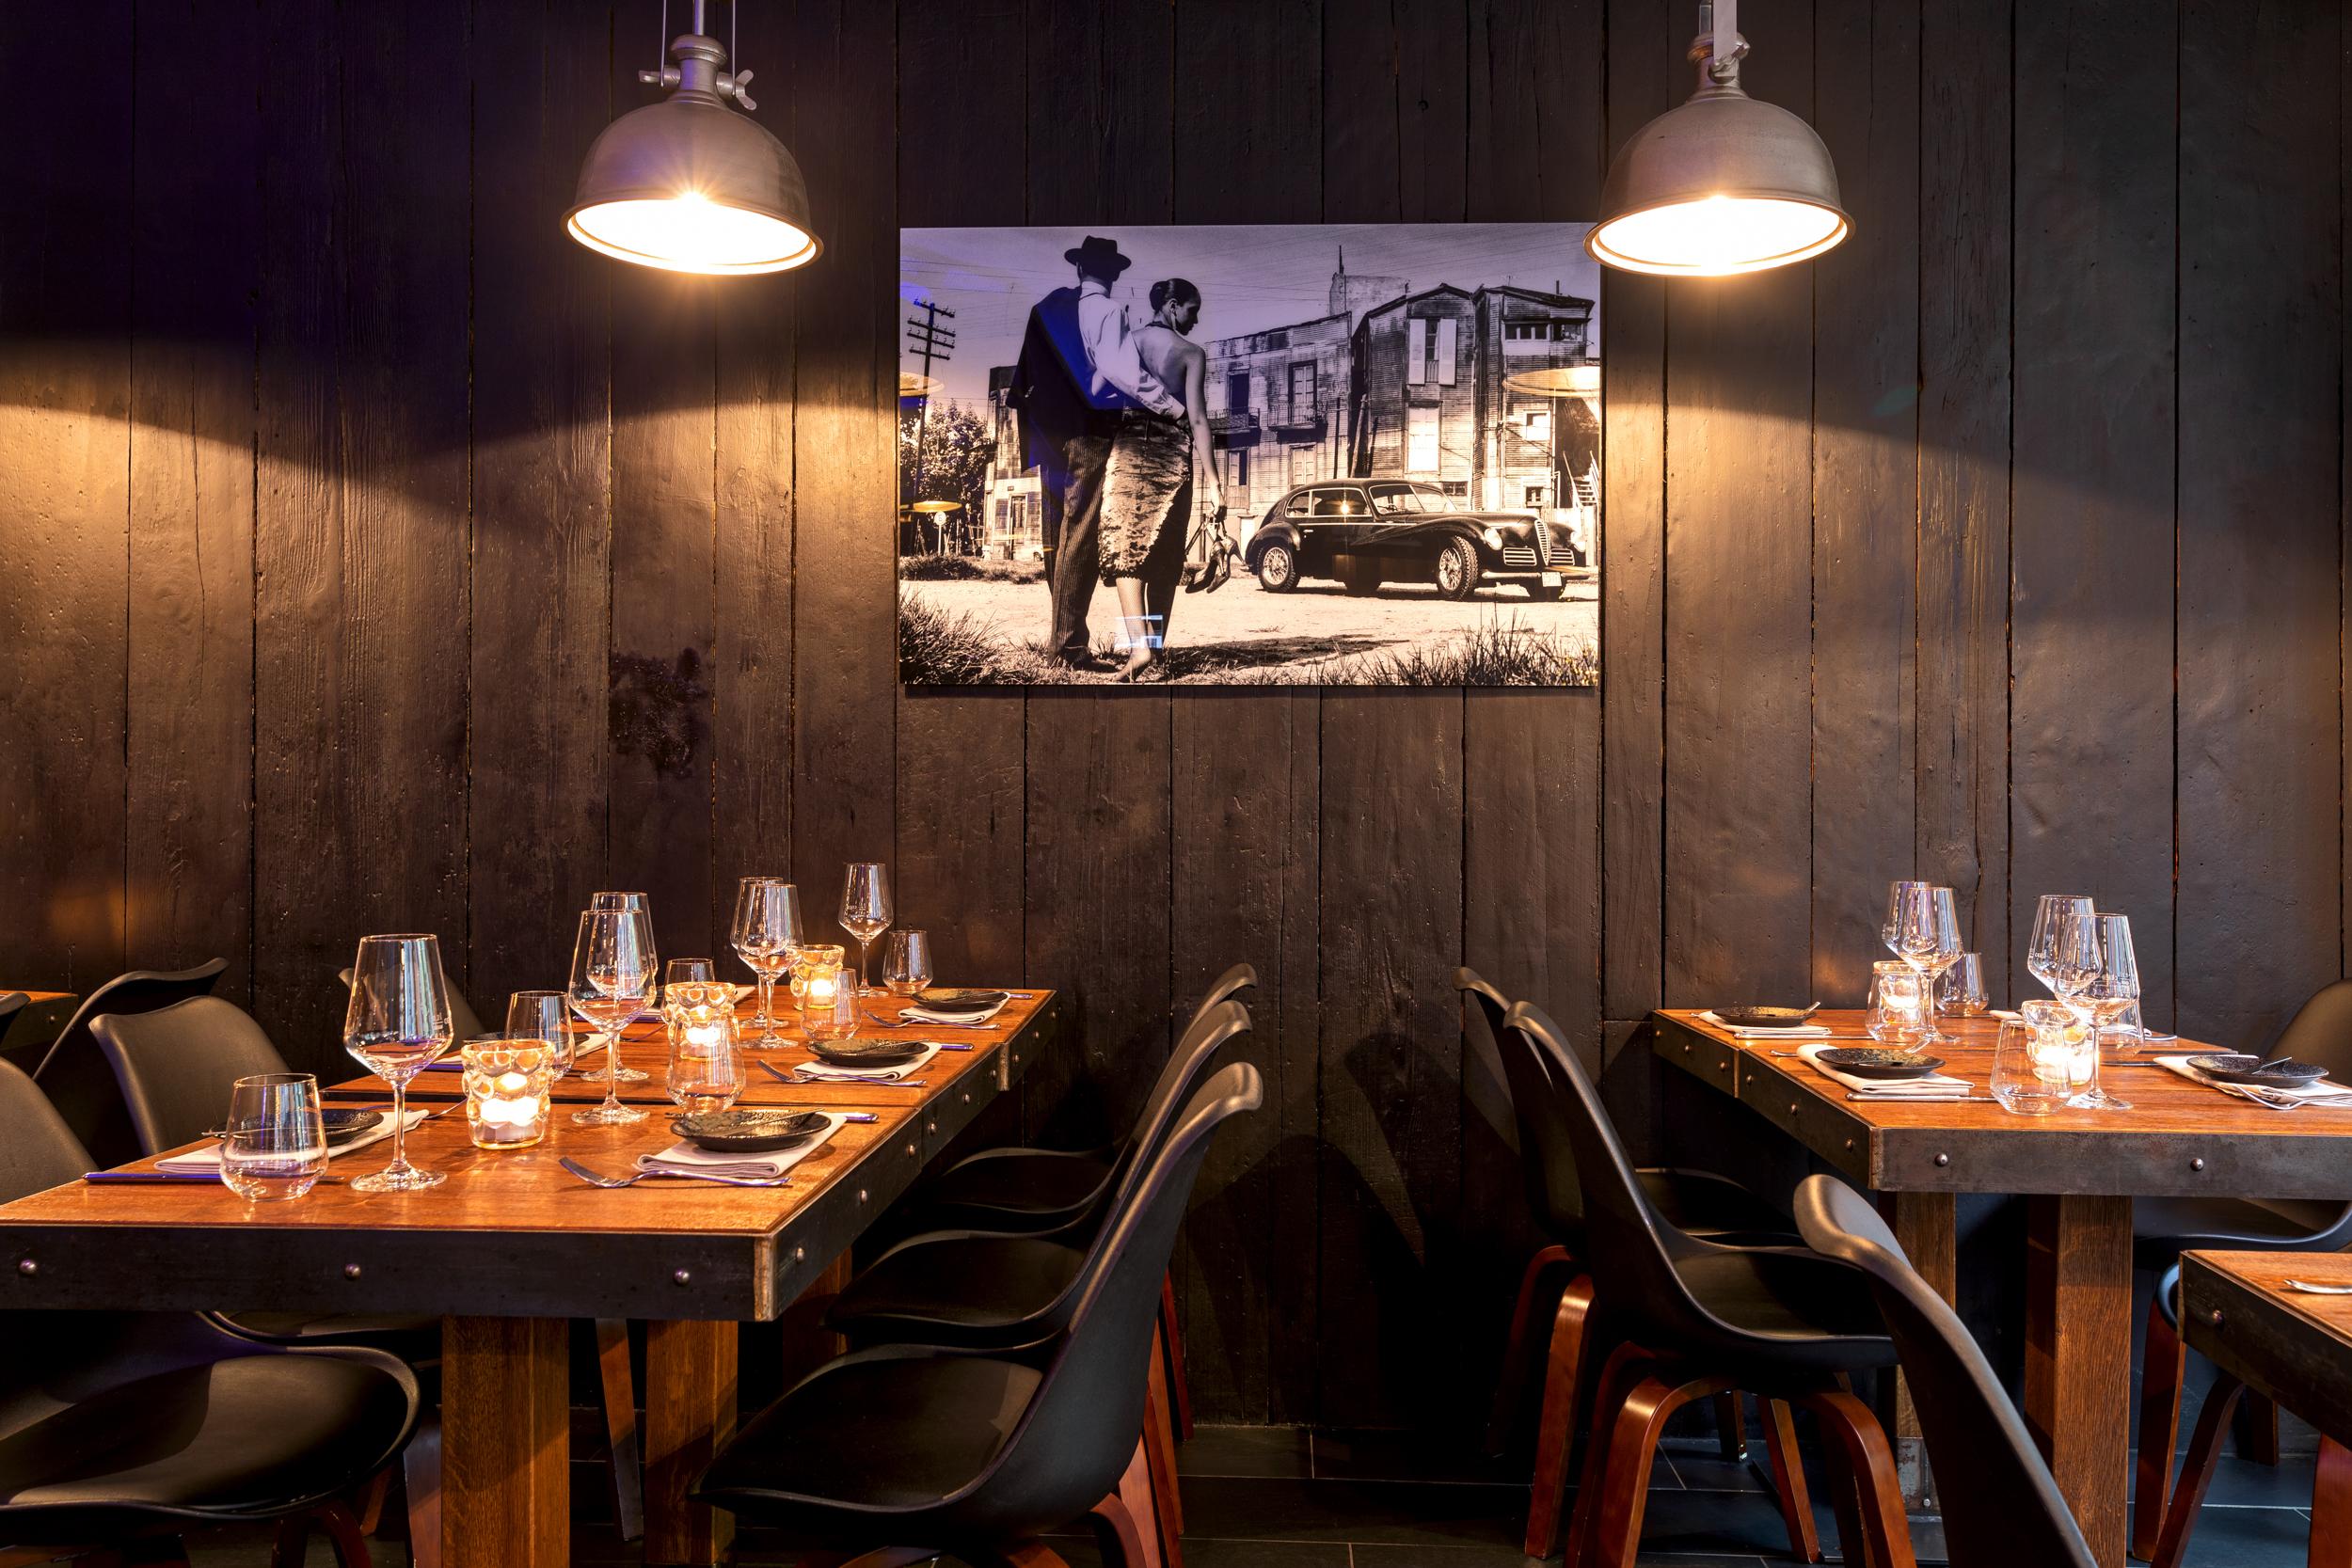 Restaurant 12 restaurant photography